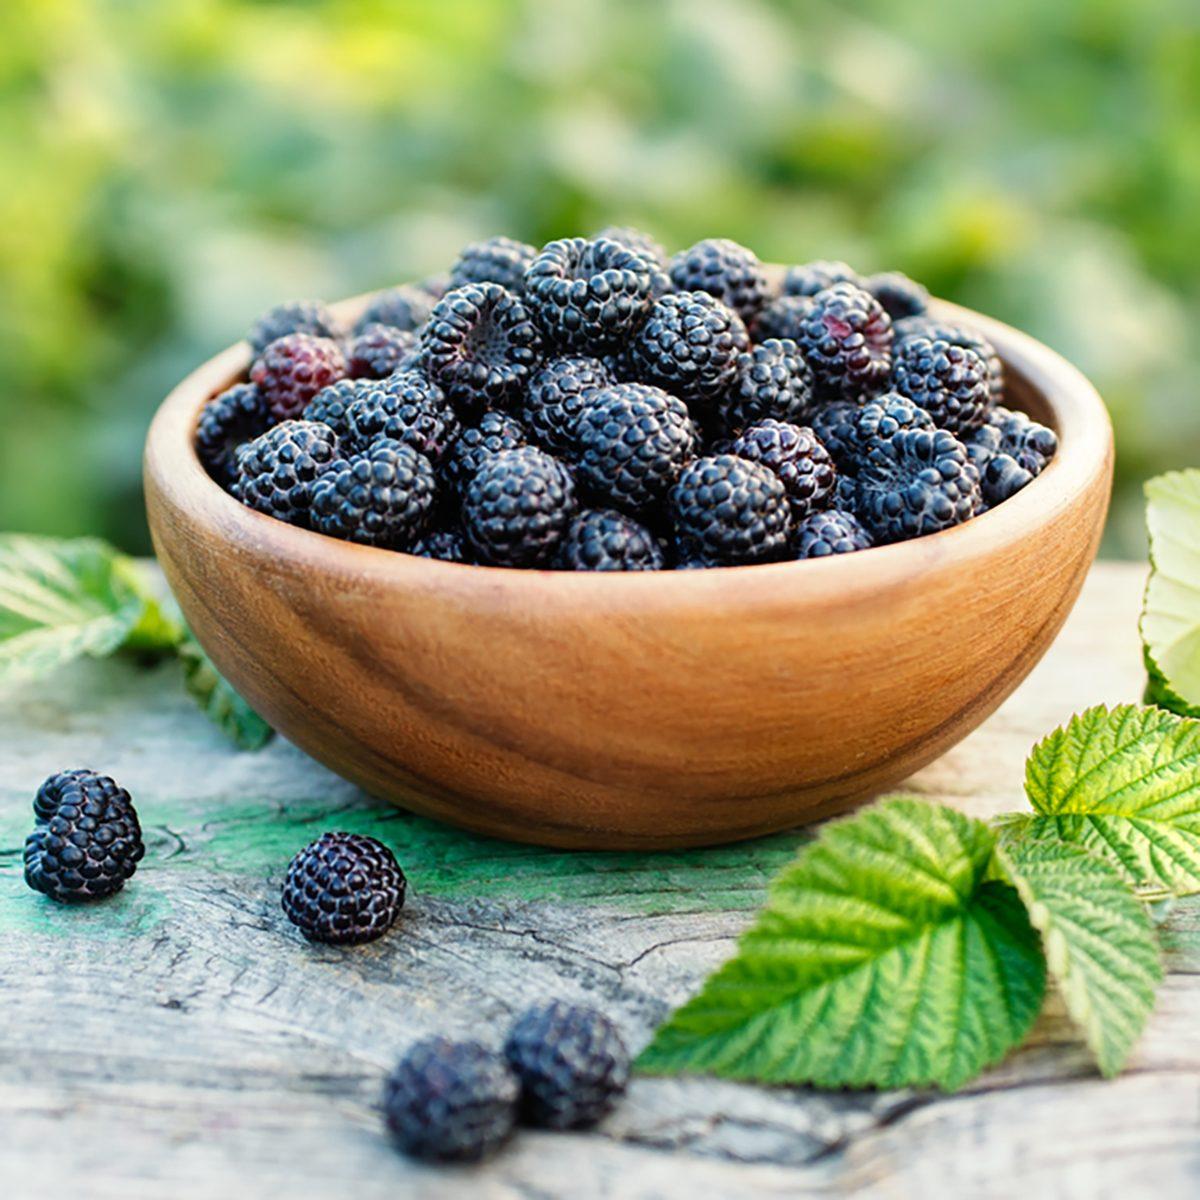 Black raspberries in a bowl in the garden.